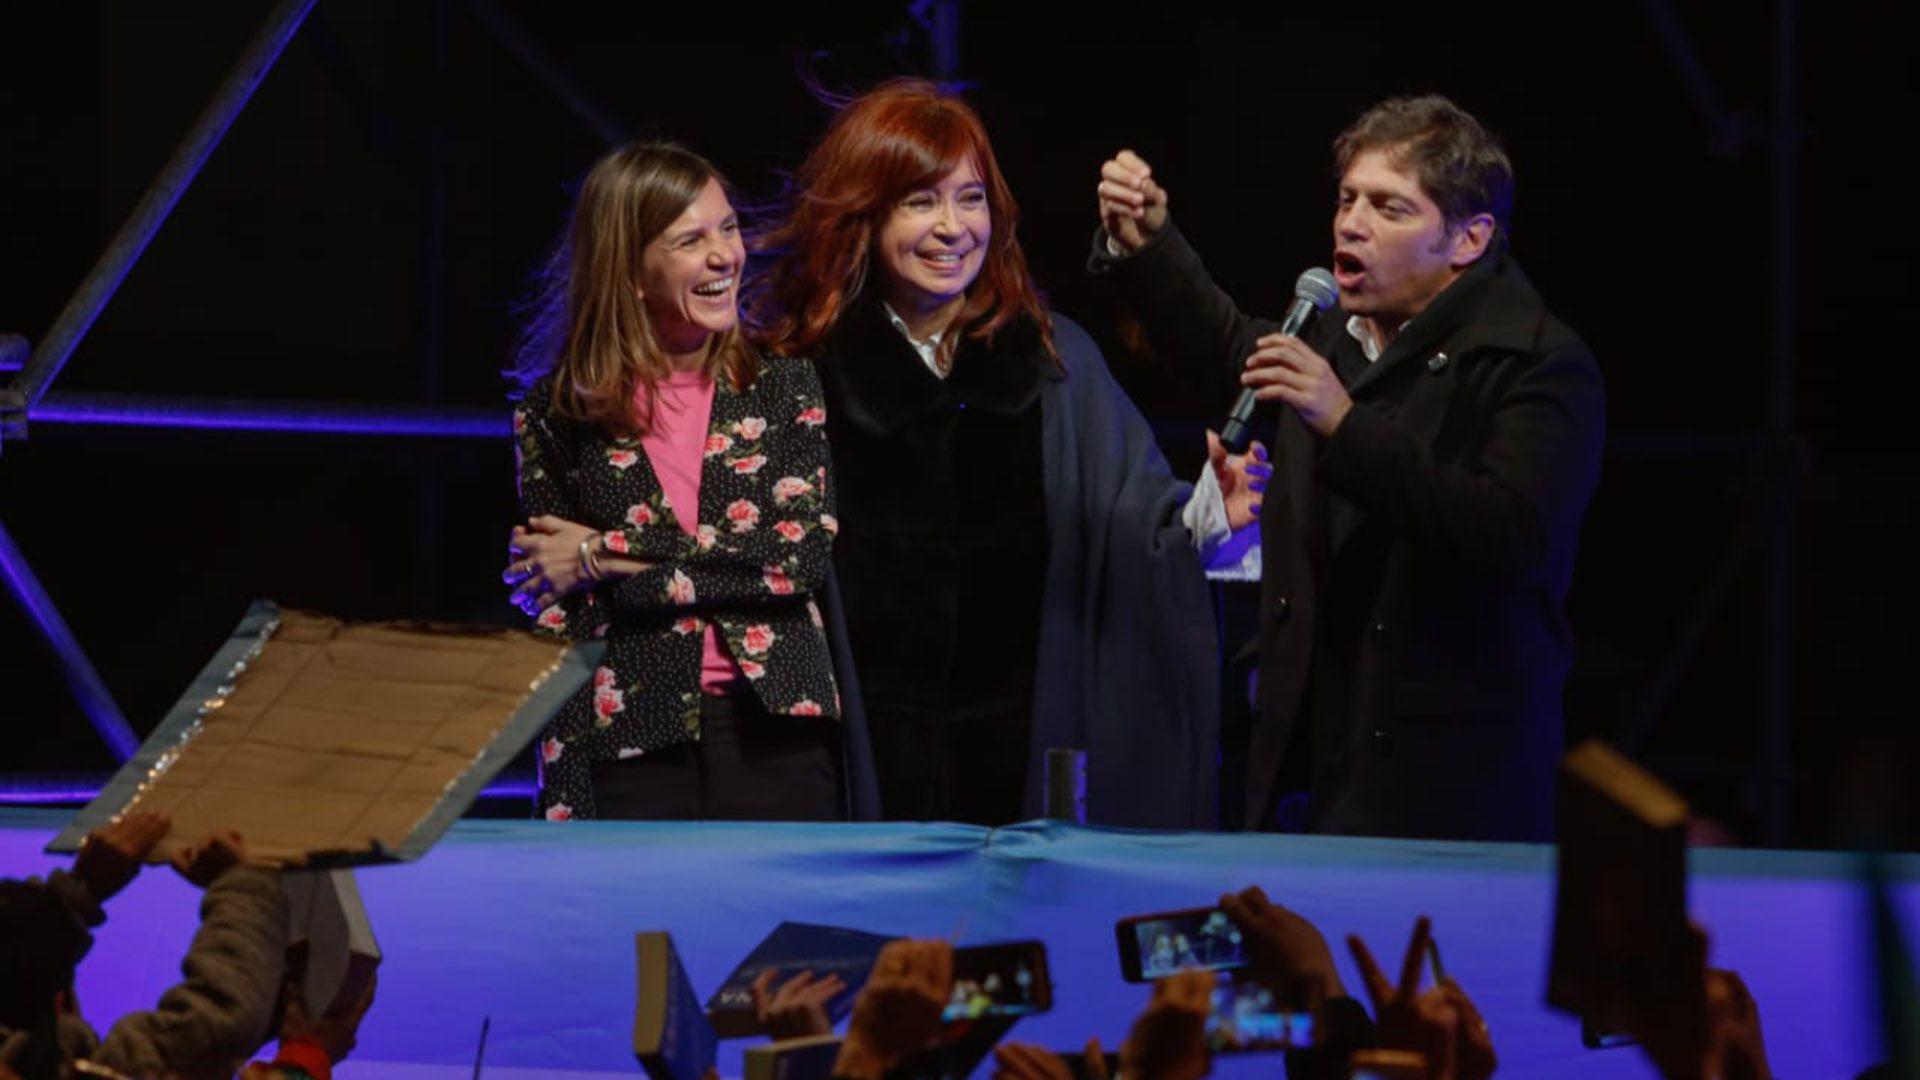 Raverta junto a Cristina Kirchner y Axel Kicillof en la campaña 2019